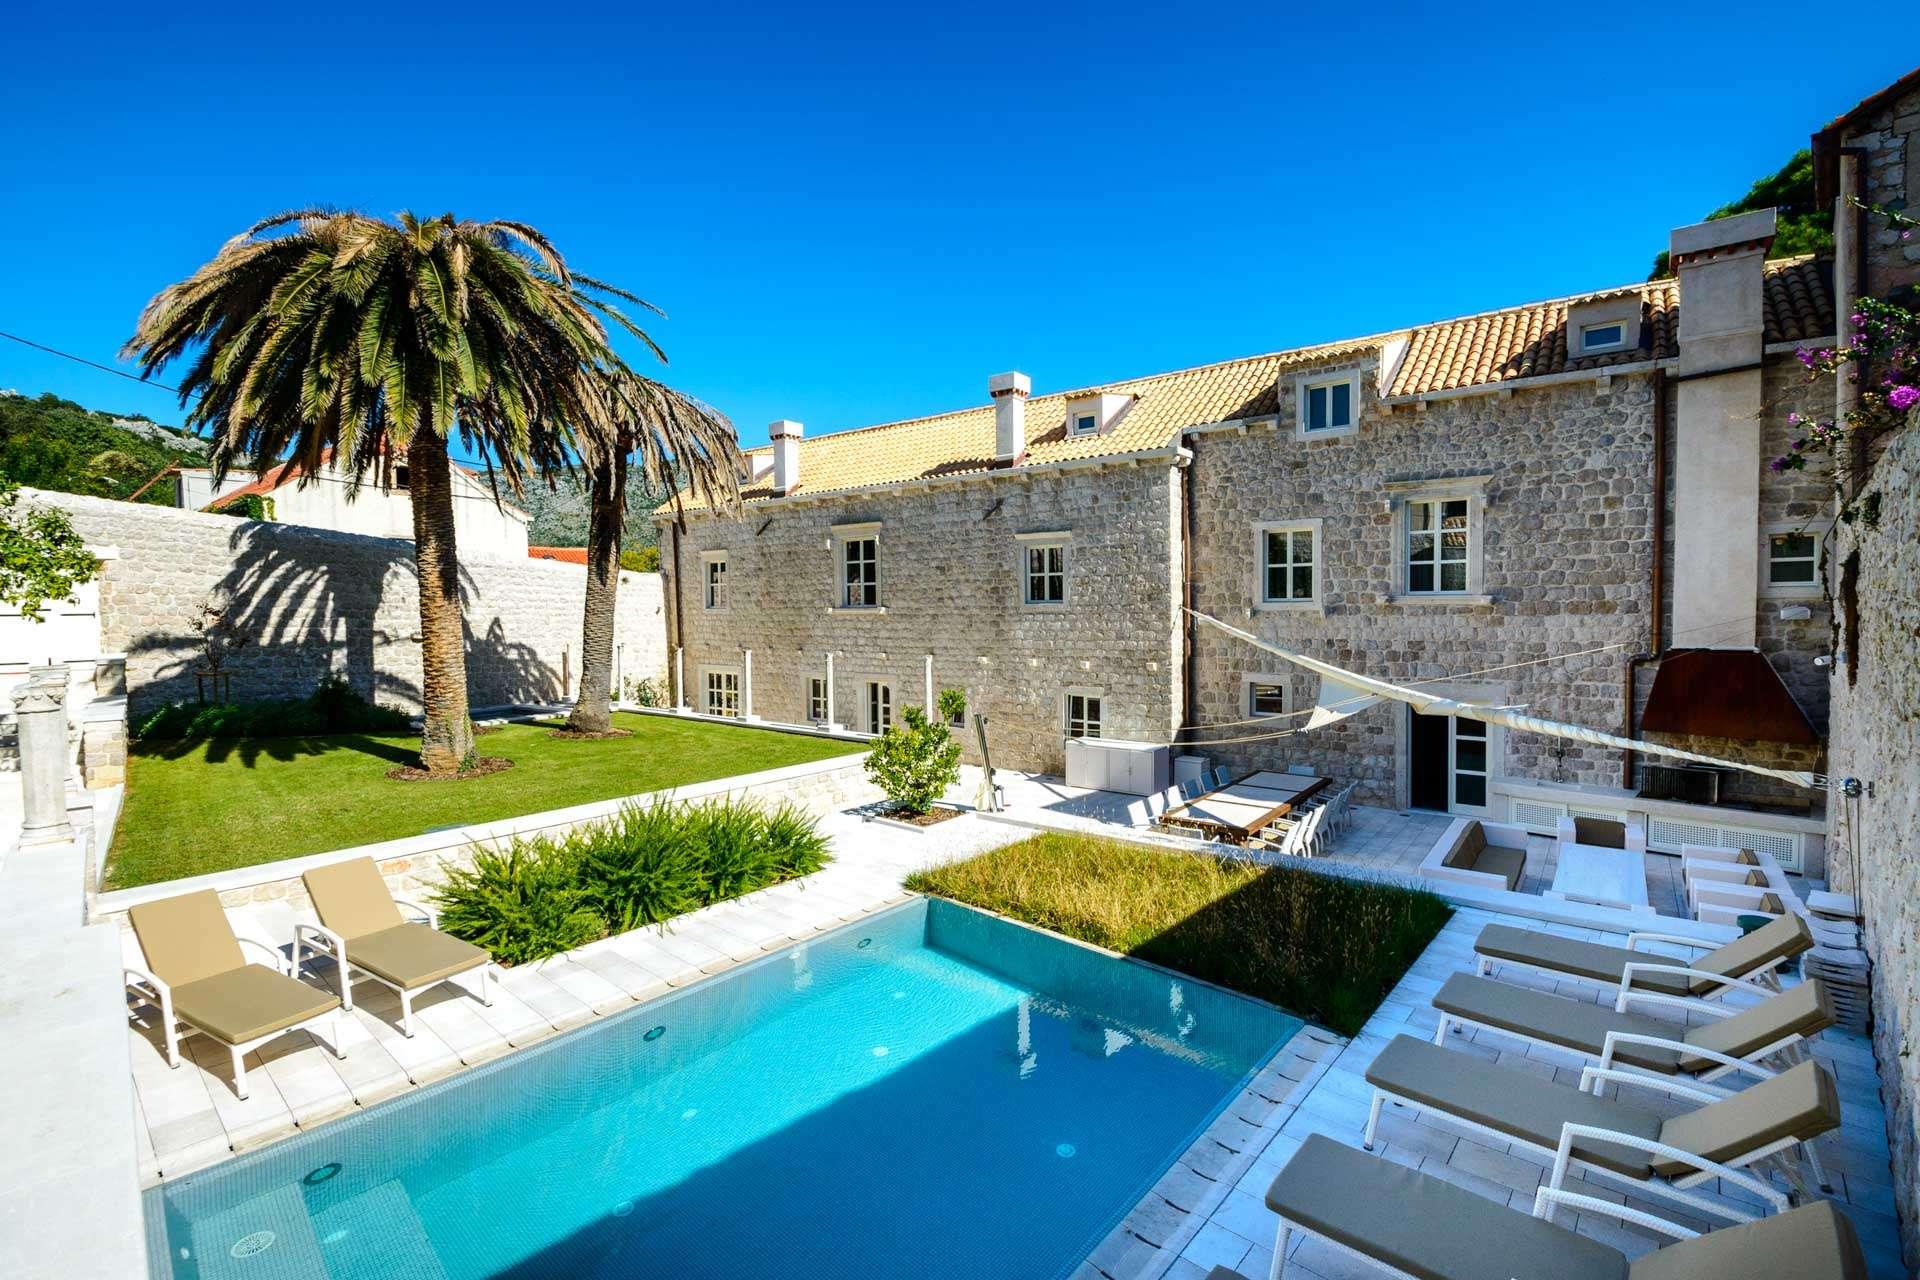 Luxury vacation rentals europe - Croatia - Dalmatia - Zaton - Exclusive Castello - Image 1/72